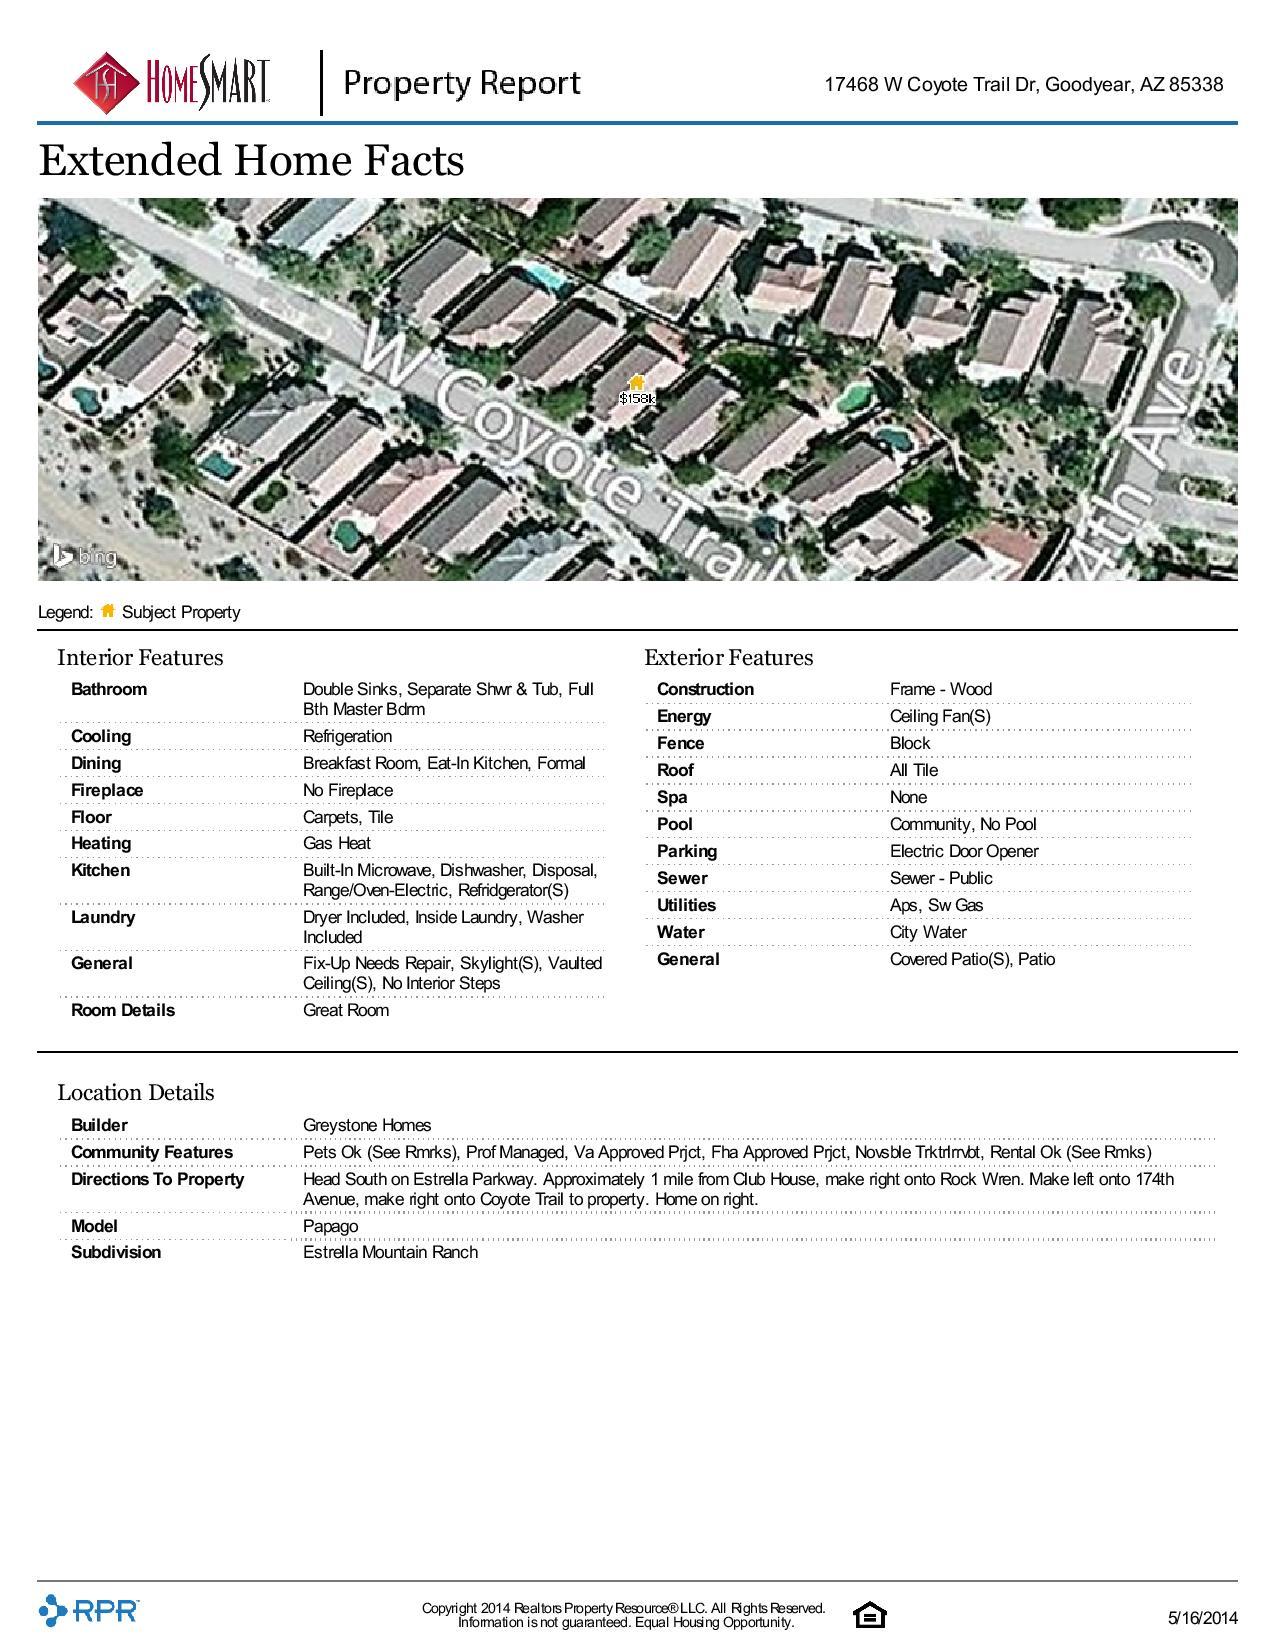 17468-W-Coyote-Trail-Dr-Goodyear-AZ-85338-page-004